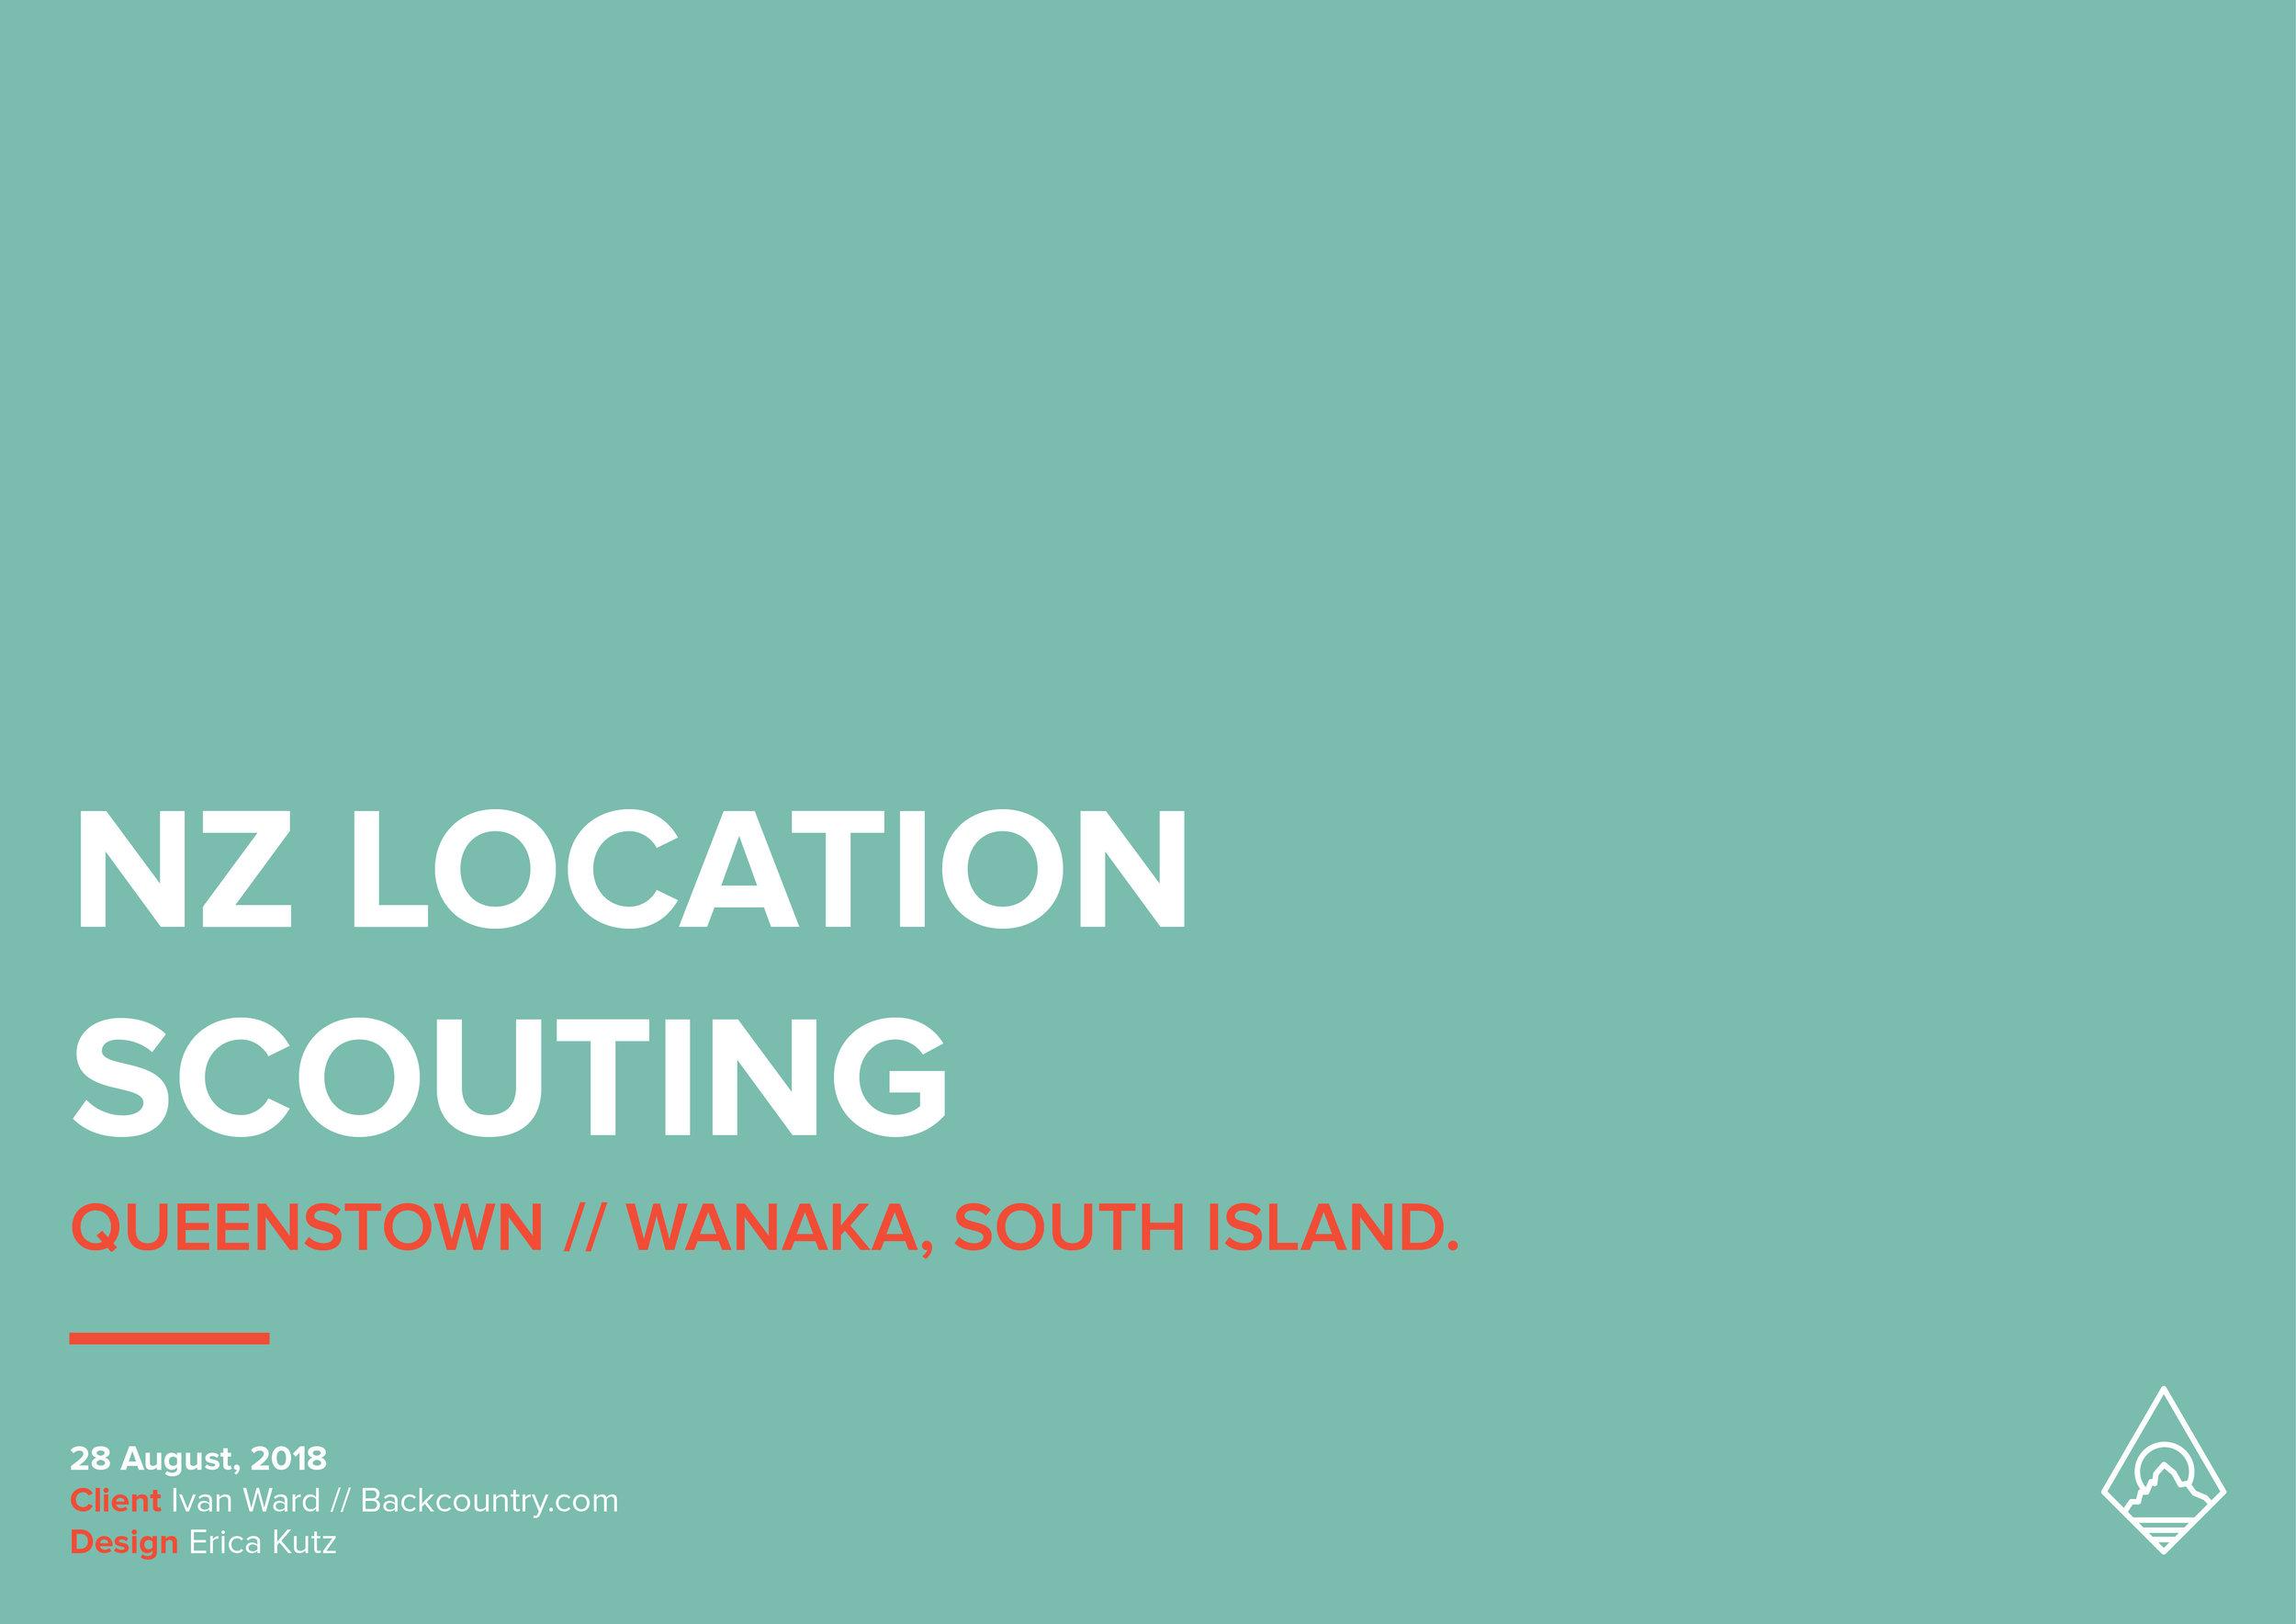 Backcountry-NZ-LocationRecci.jpg